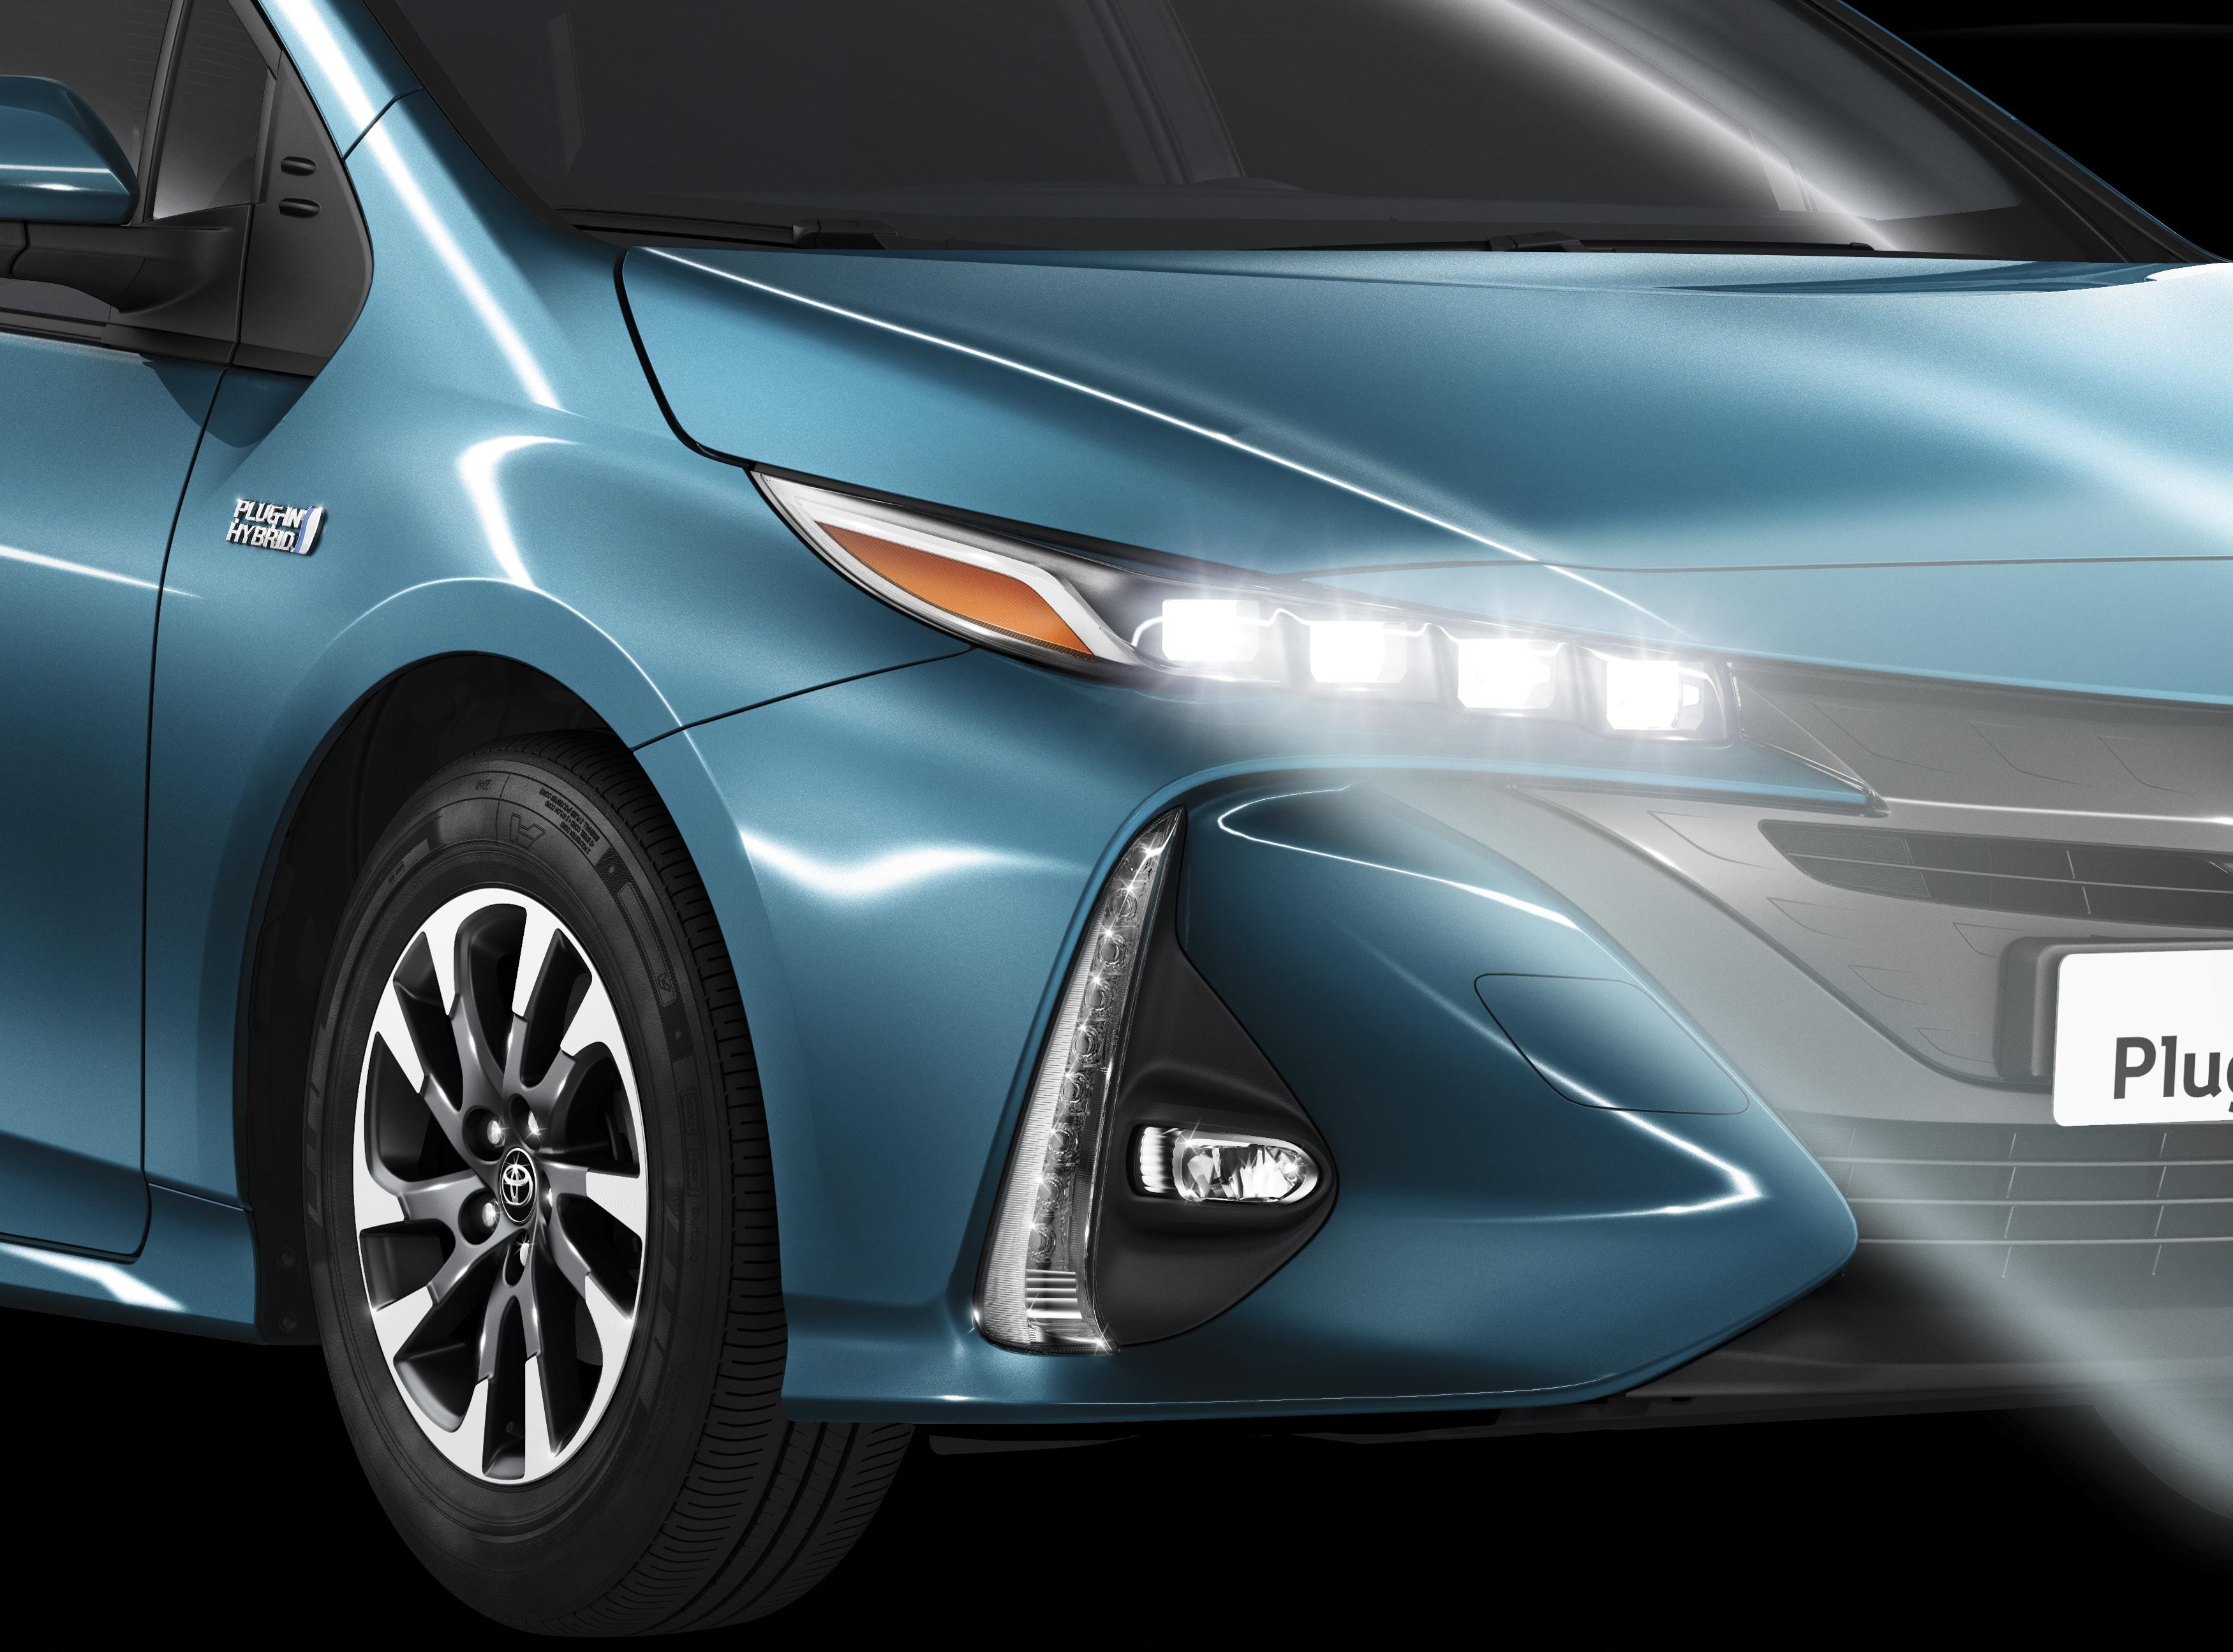 New Toyota Prius Plug-in Hybrid – double the EV range Image 612797